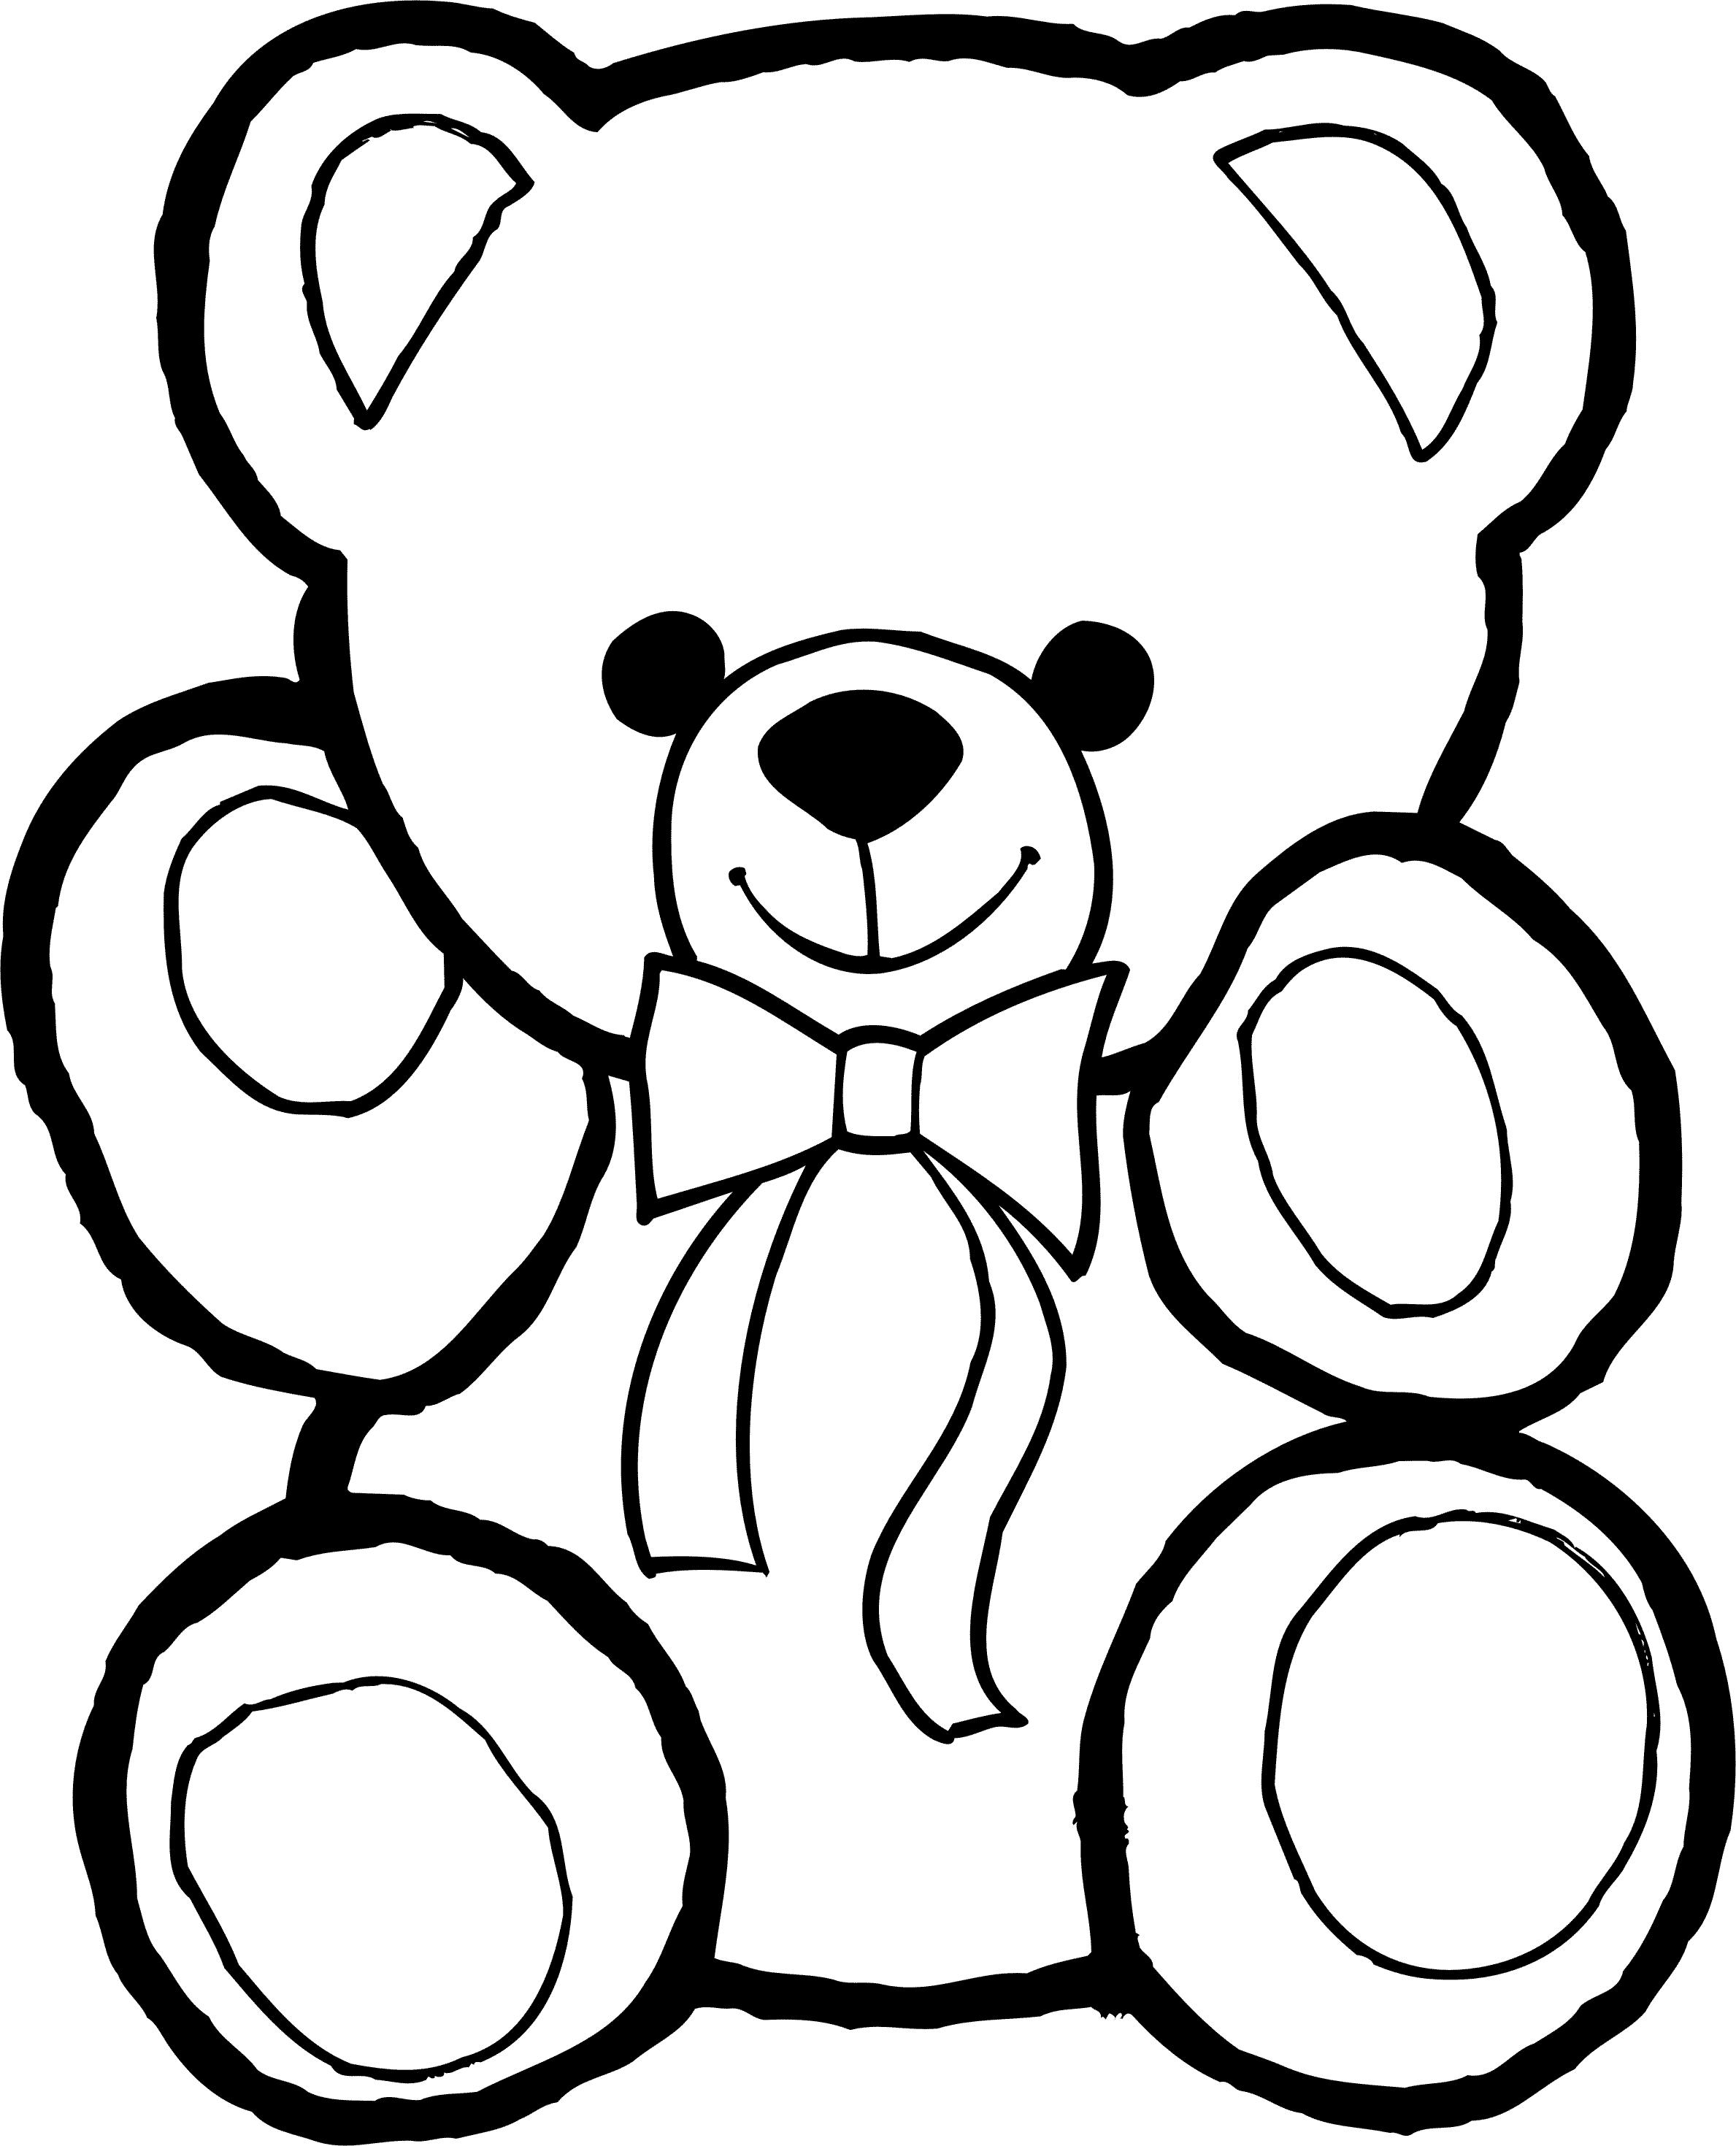 Дети и игрушки картинки раскраски